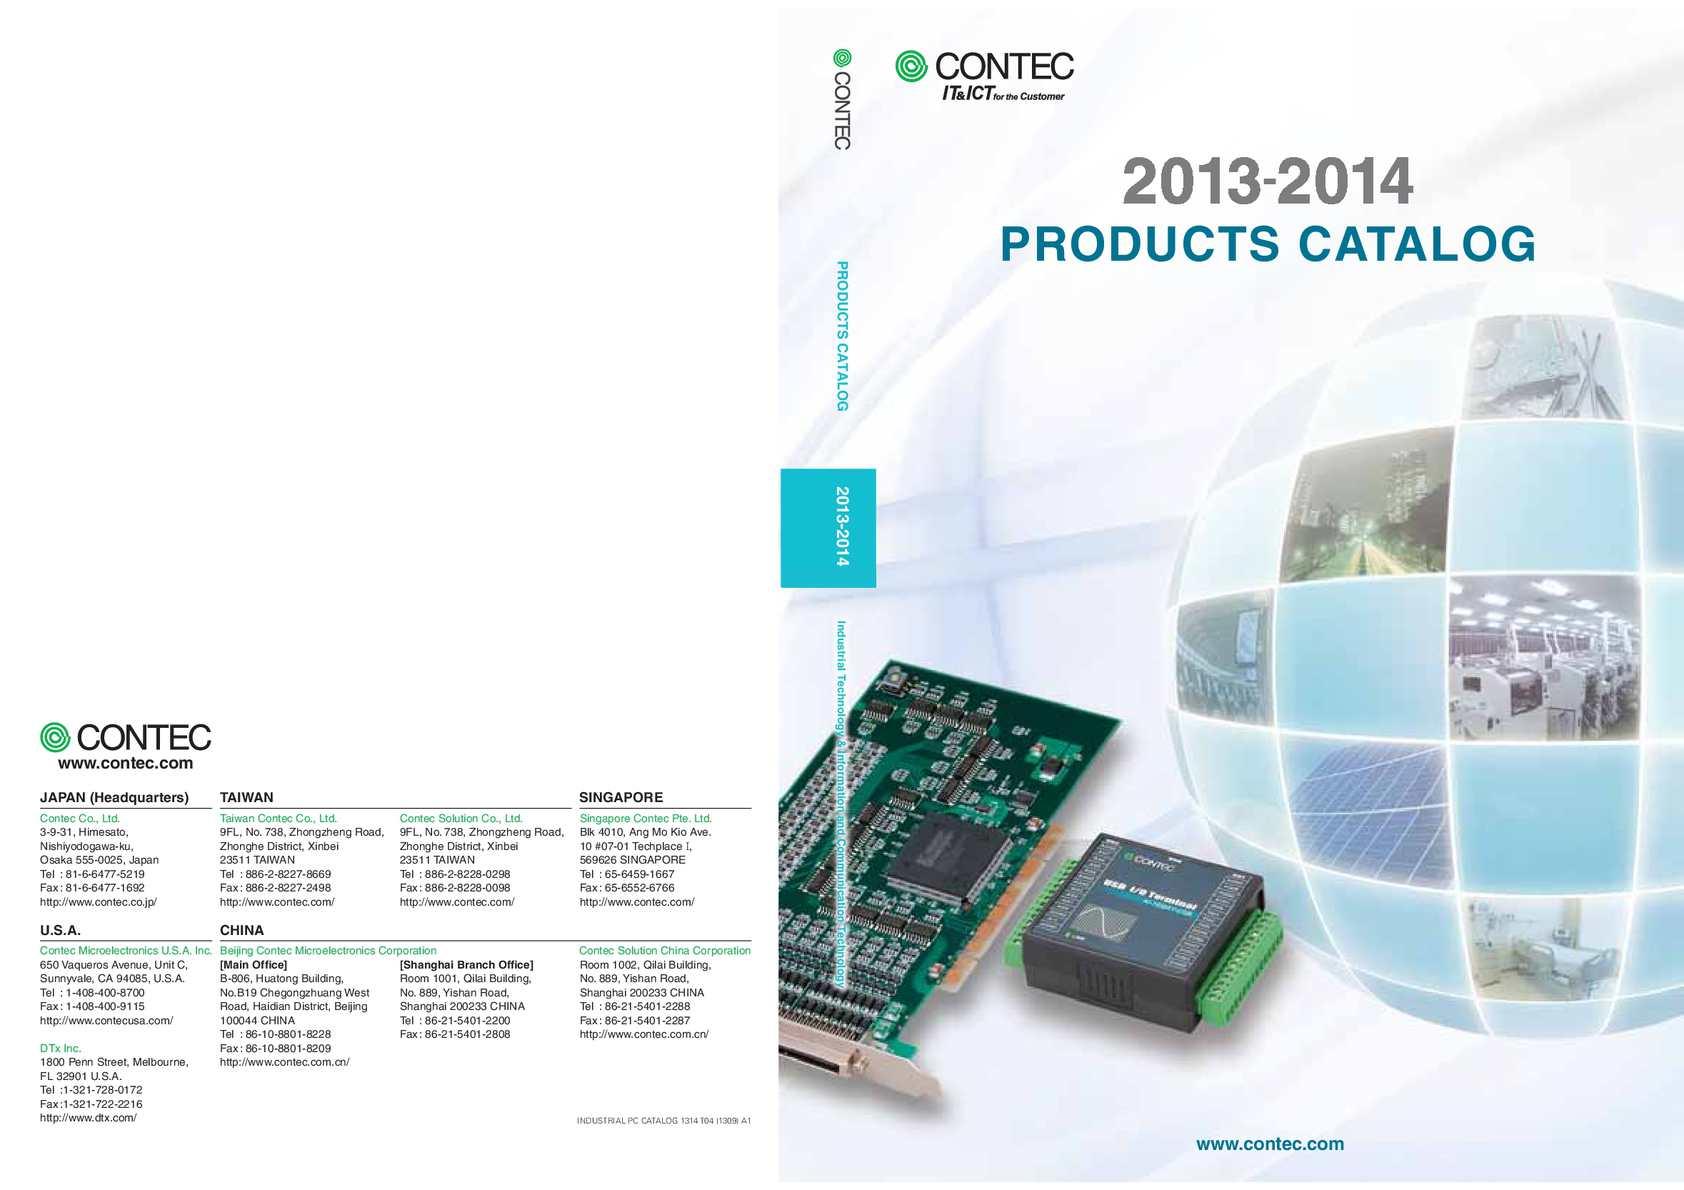 Calamo Catalogue Contec 2014 1050ma Led Flashlight Driver Board 5 Mode Circuit